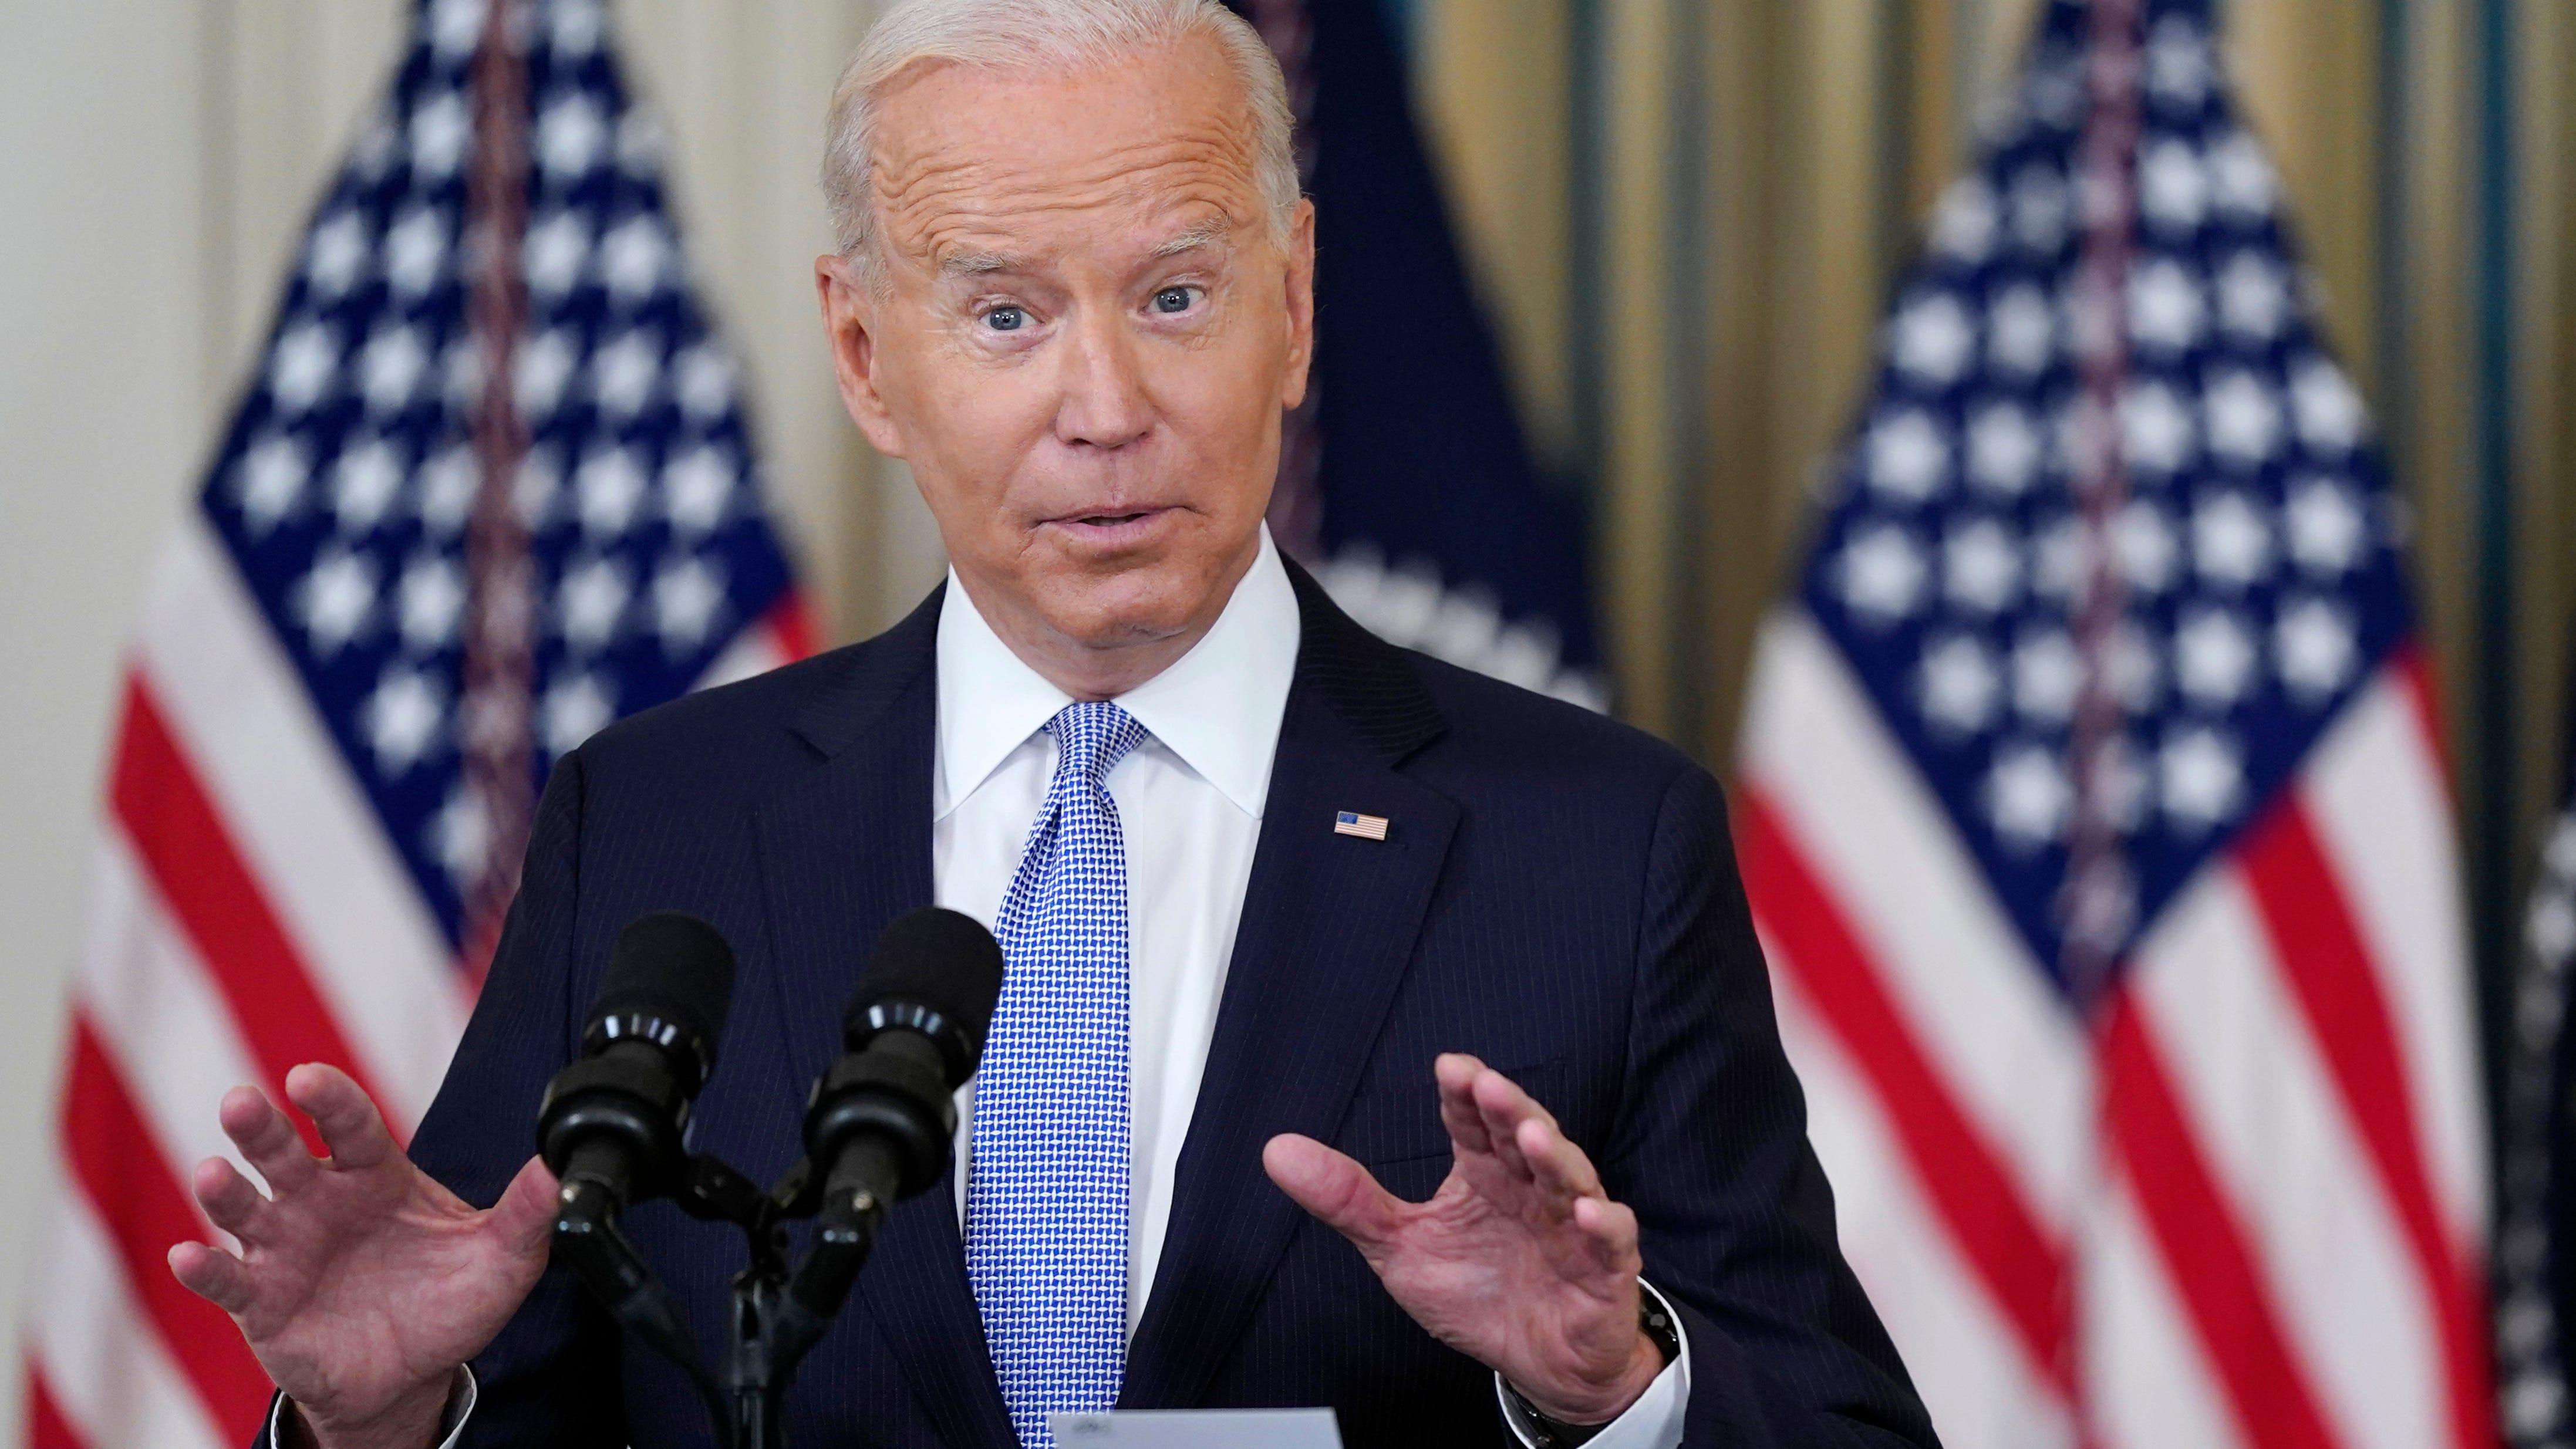 President Joe Biden will visit New Jersey on Monday